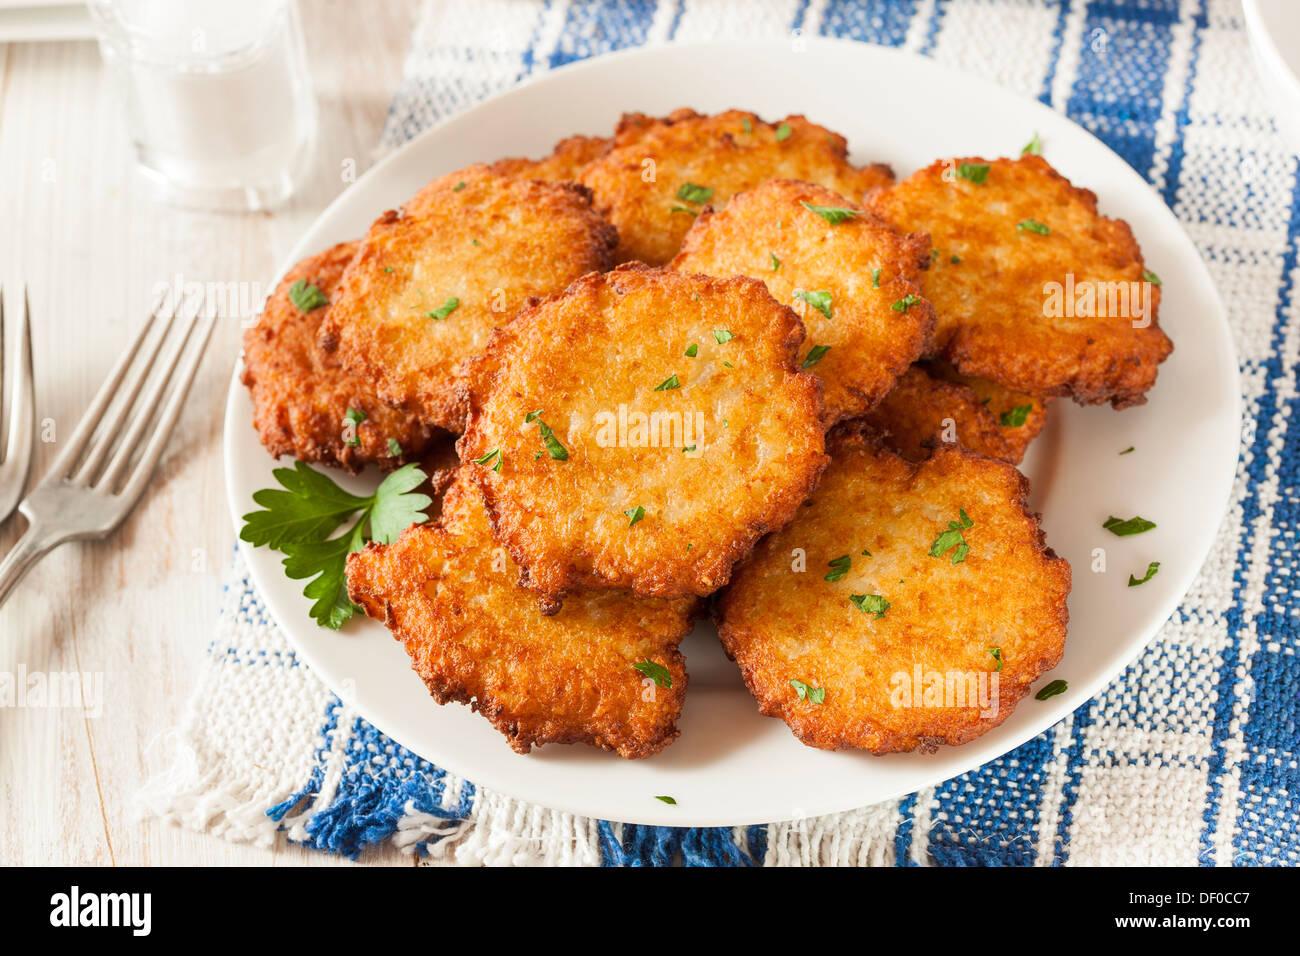 Homemade Traditional Potato Pancake Latke on a Background - Stock Image